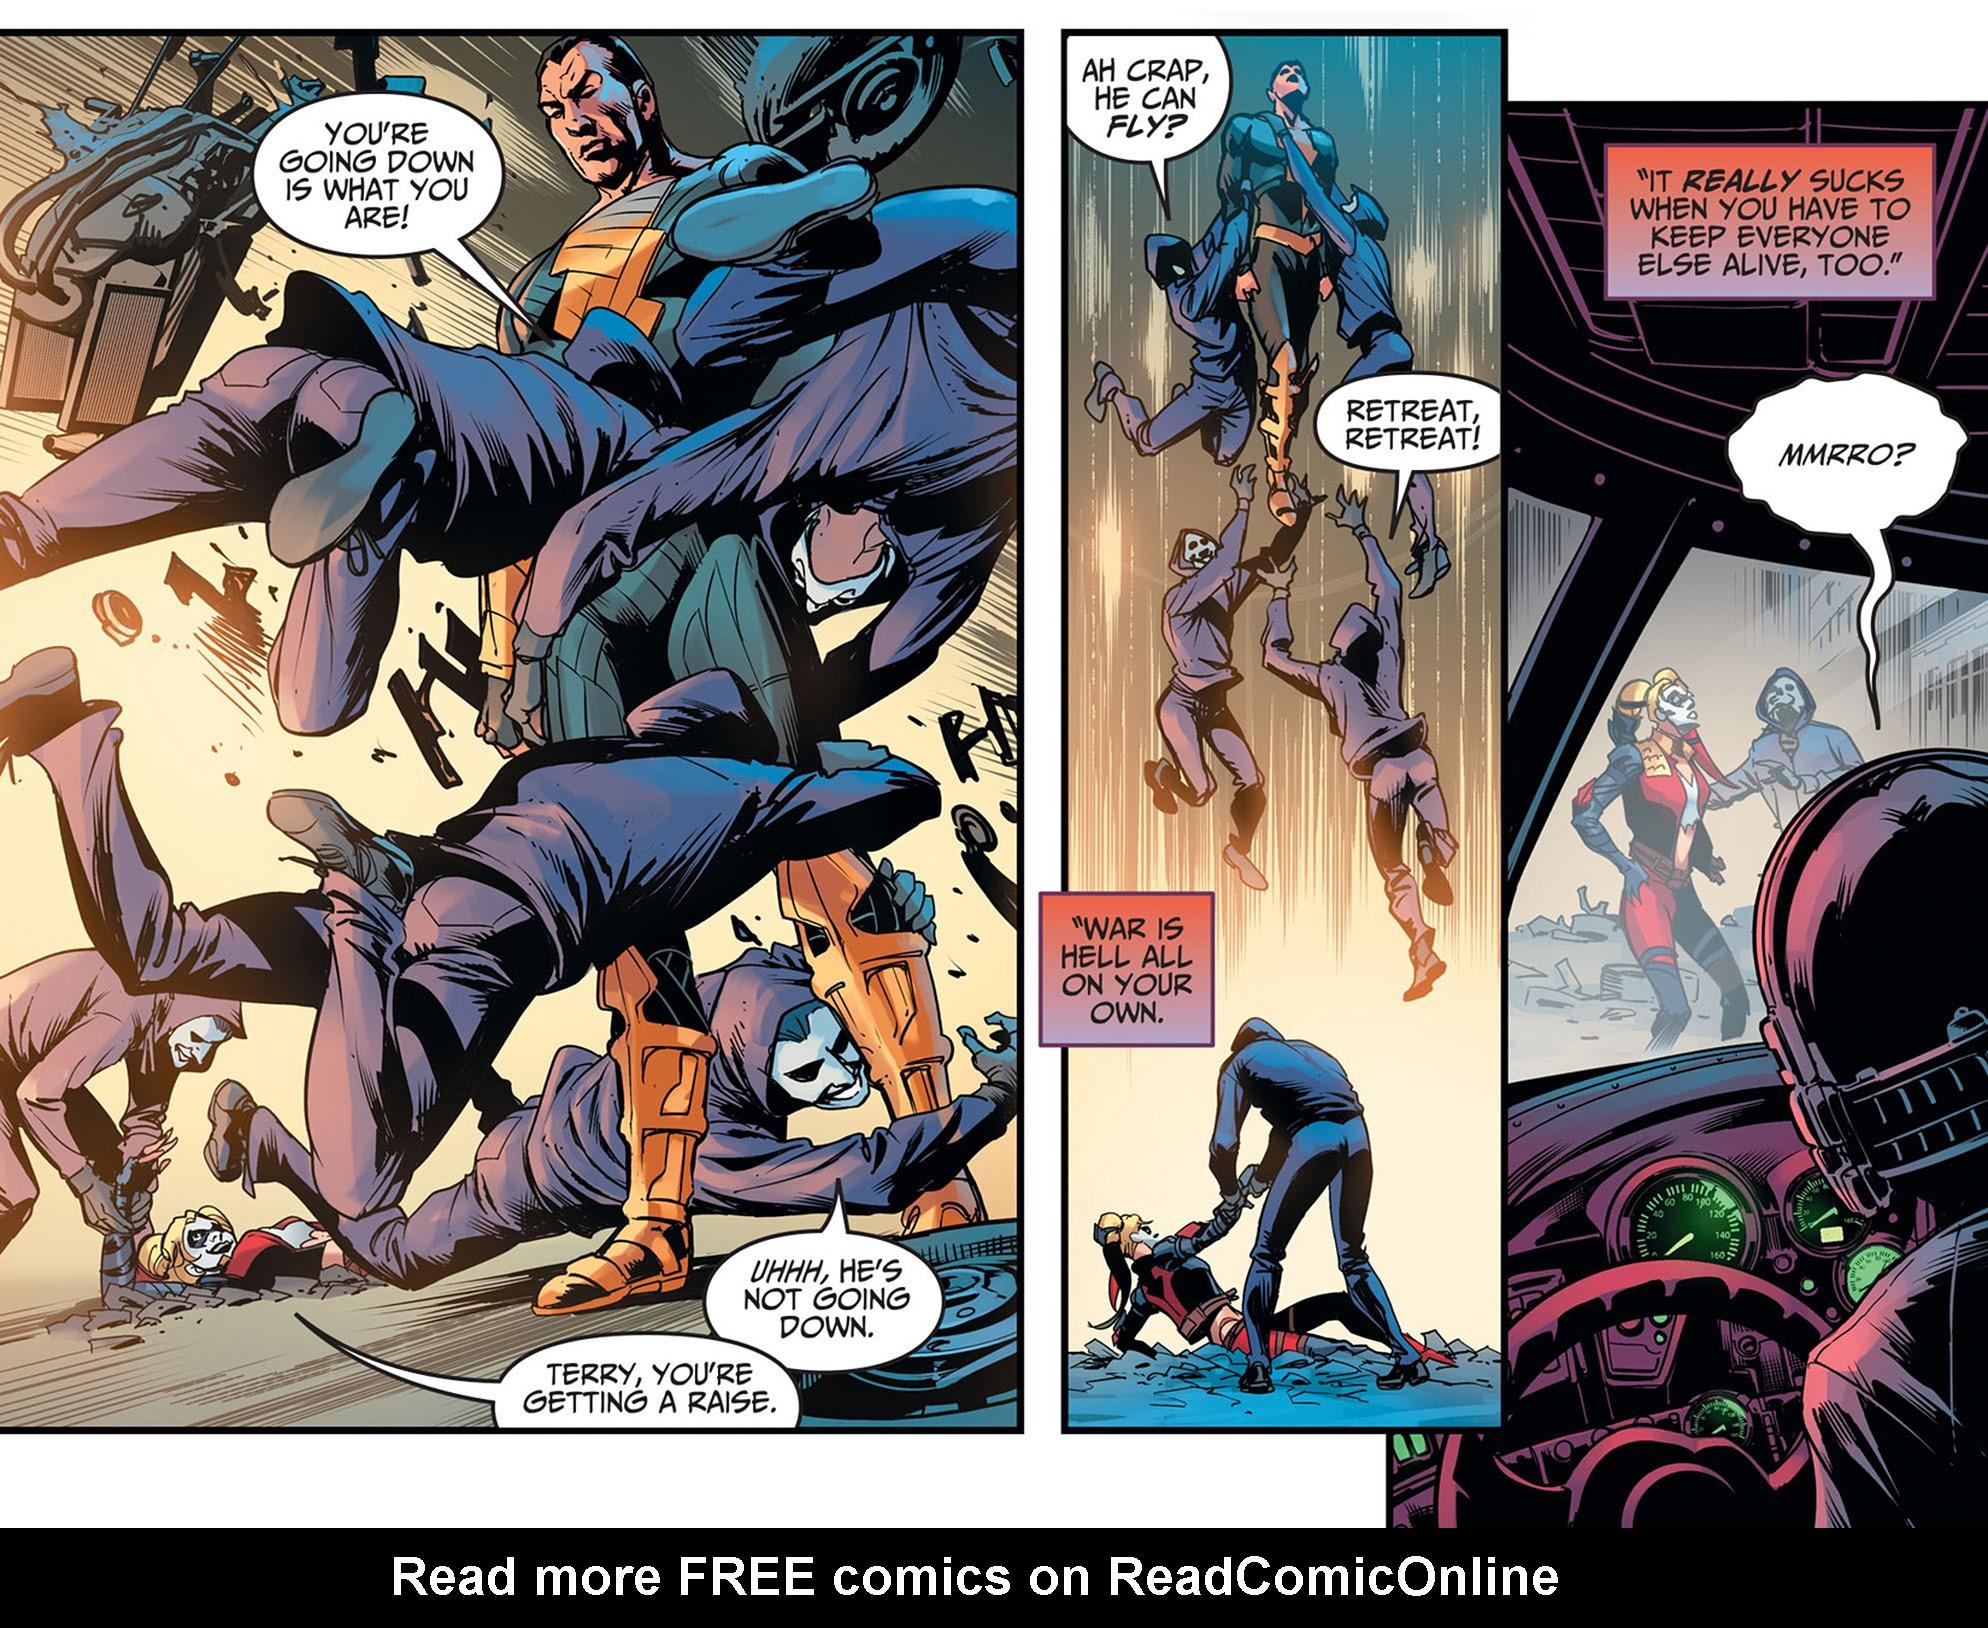 Read online Injustice: Ground Zero comic -  Issue #11 - 15